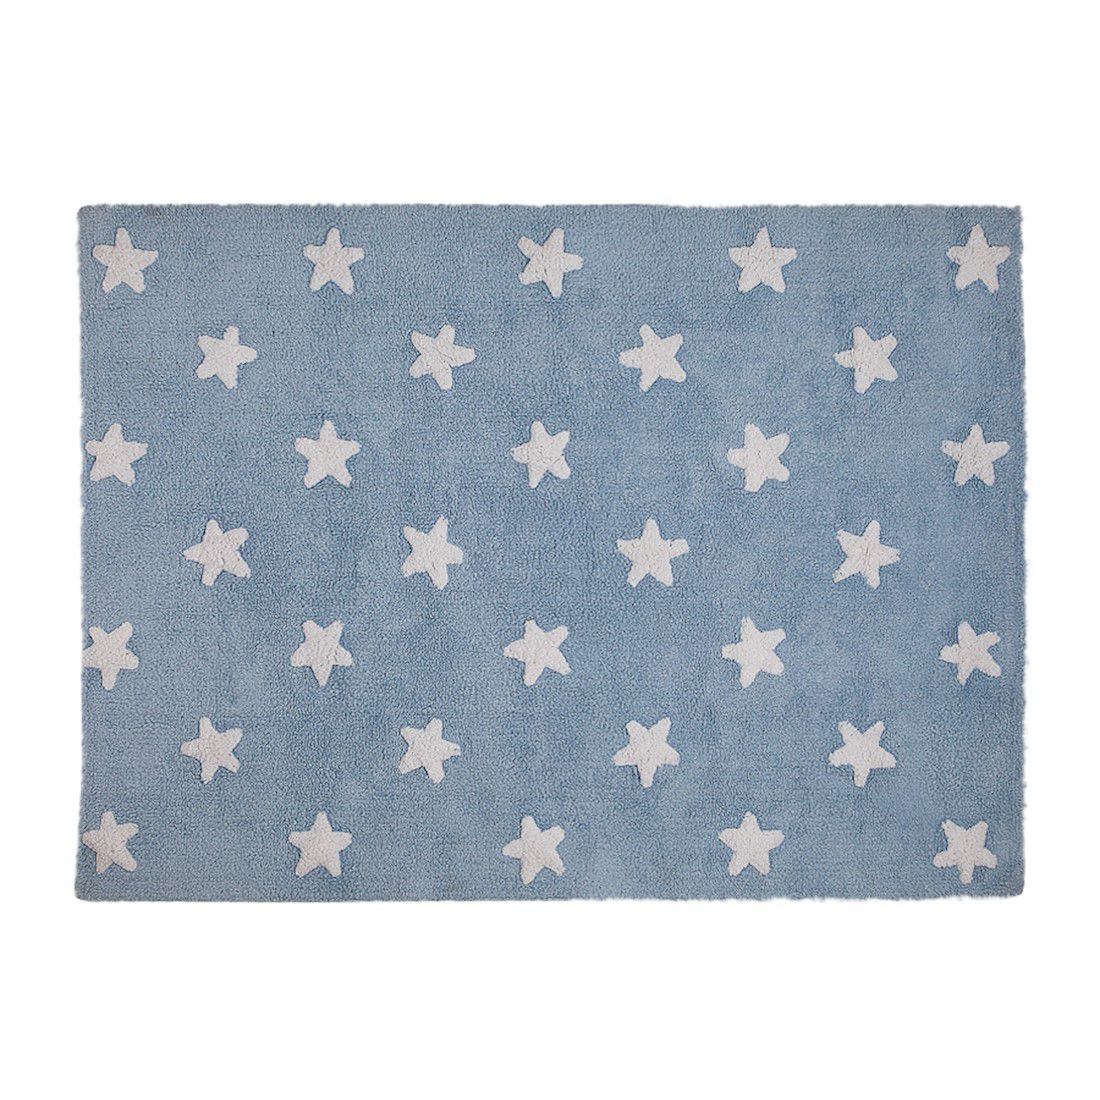 Tapete Lorena Canals Estrelas Azul 120 x 160 cm